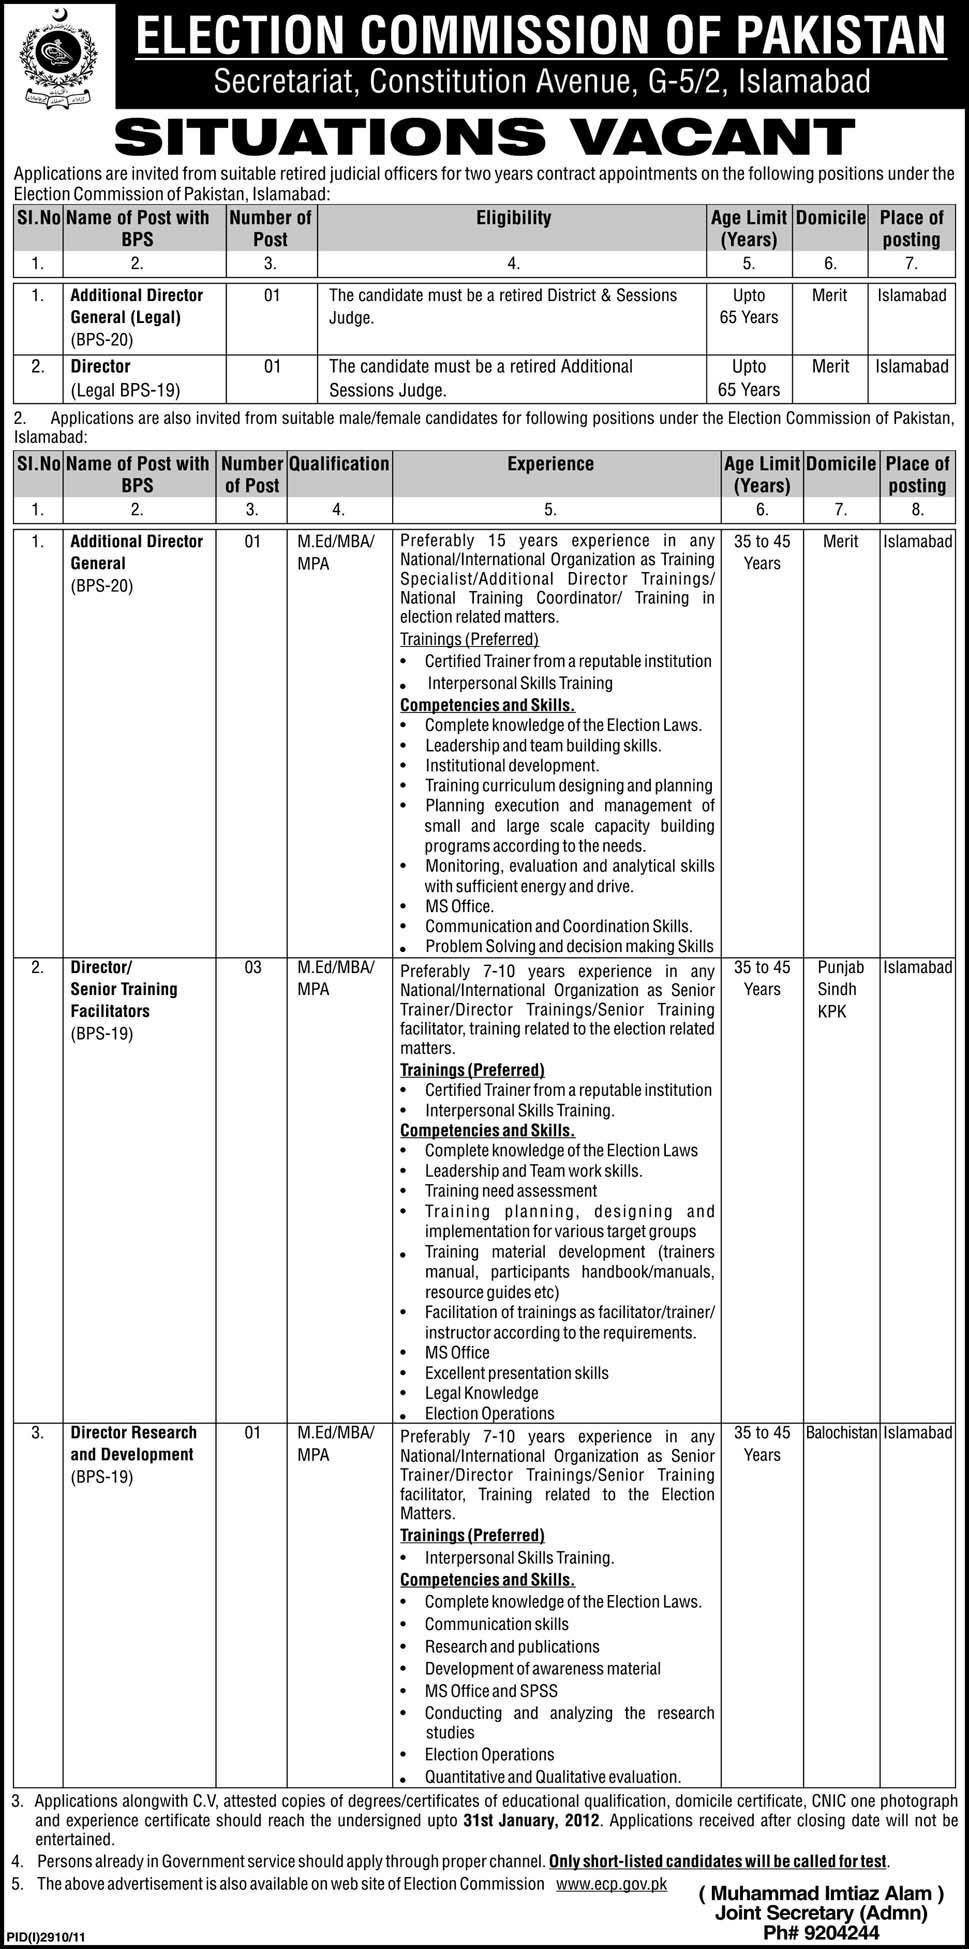 Additional Directors, Director Senior / Training Required